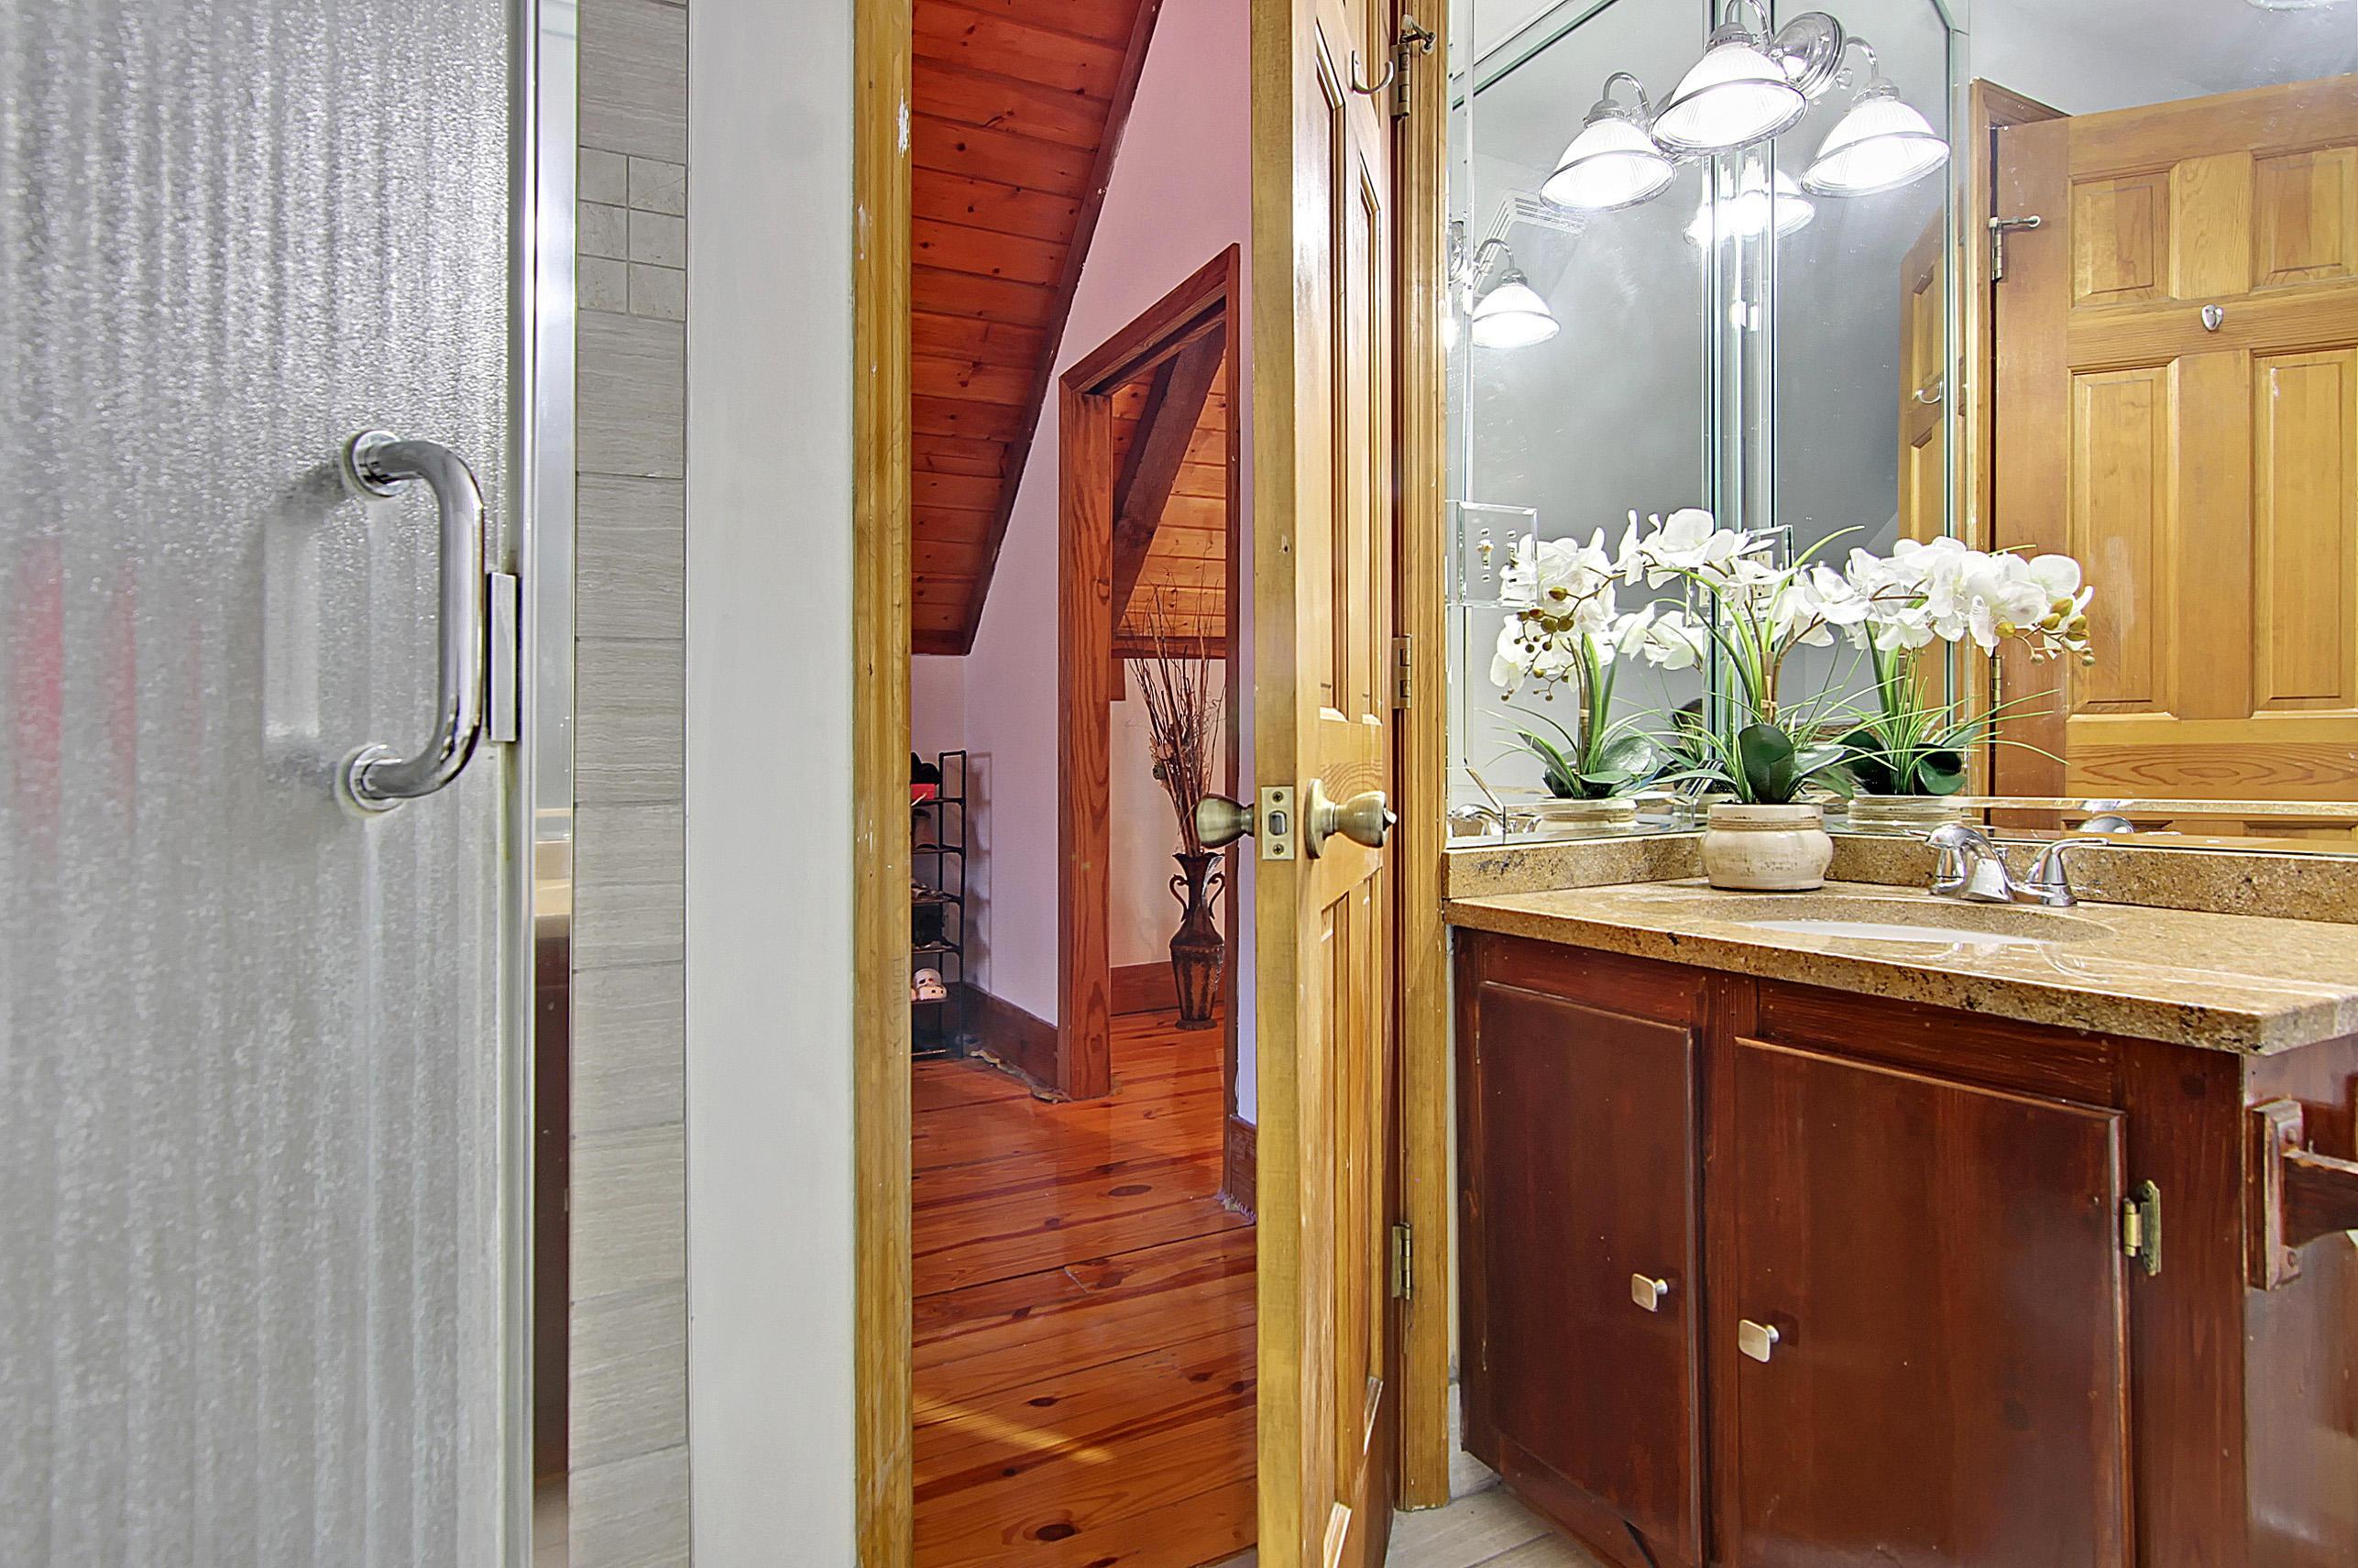 Rainbow Acres Homes For Sale - 428 Rainbow Acres, Moncks Corner, SC - 47